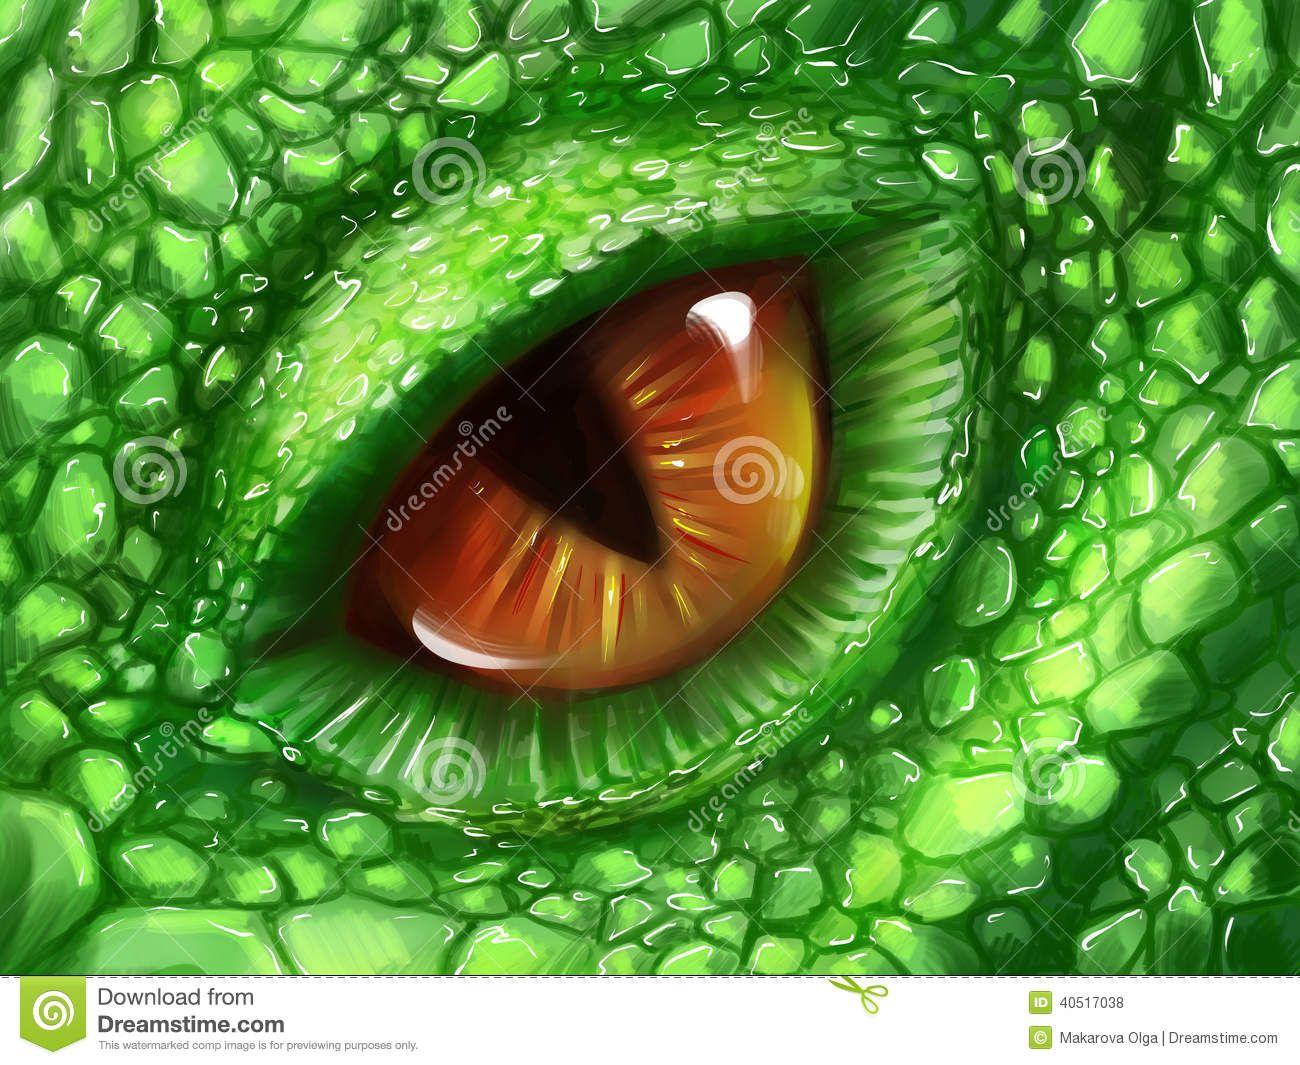 Eye Green Dragon Hand Drawn Skin Fantasy Creature Digital Art 40517038 Jpg 1300 1065 Ojo De Dragon Criaturas Fantasticas Dragones